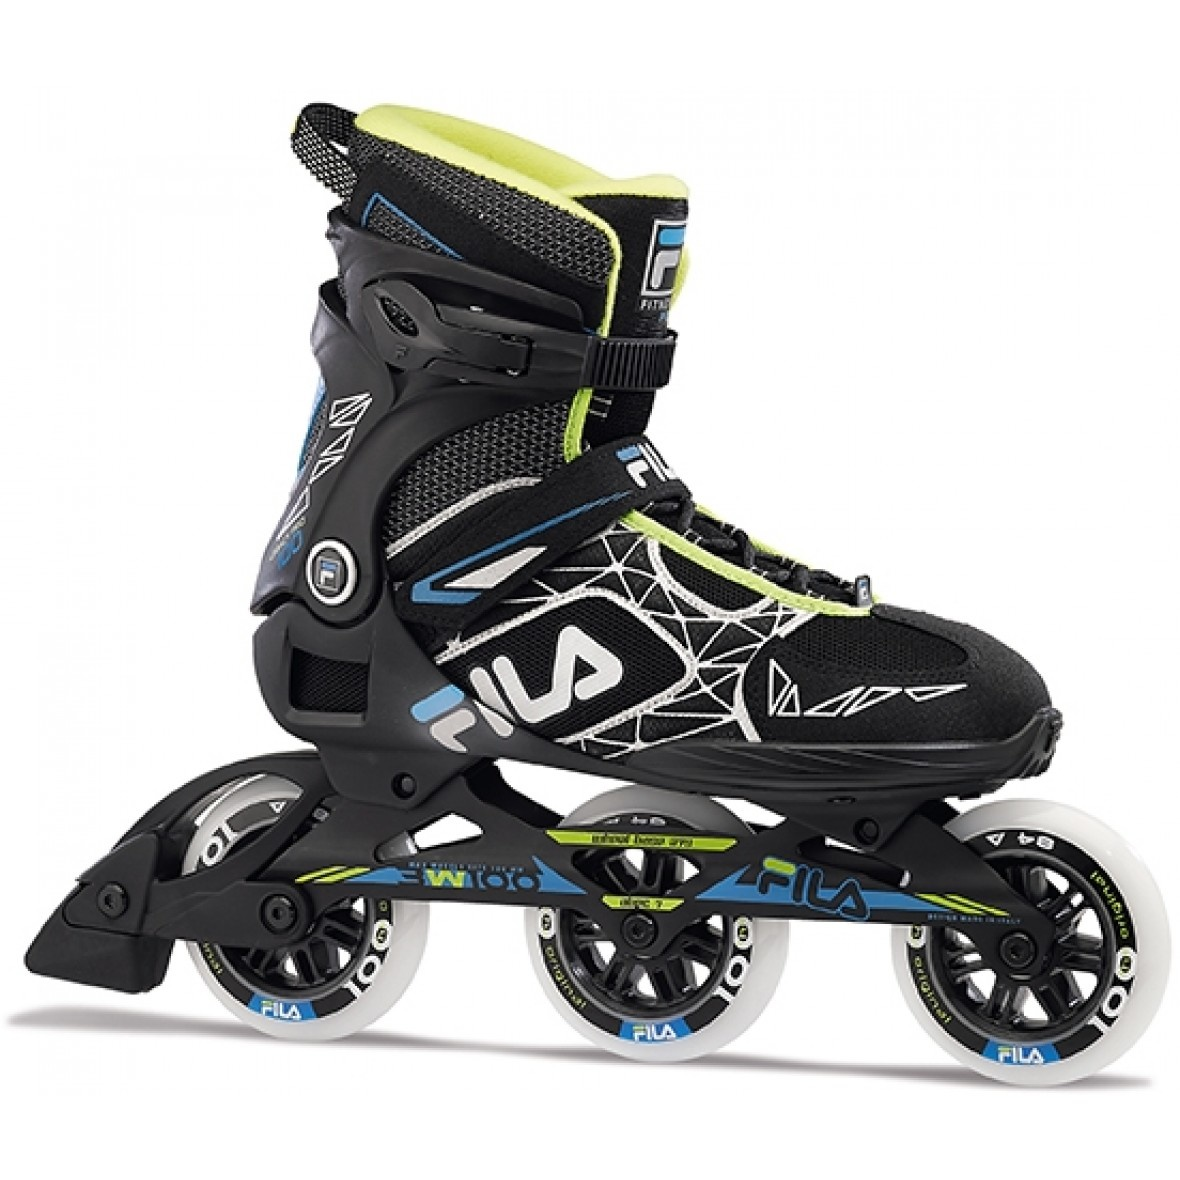 7ff61eb2373 Fila Legacy Pro 100 inline skates / skeelers zwart van inlineskates